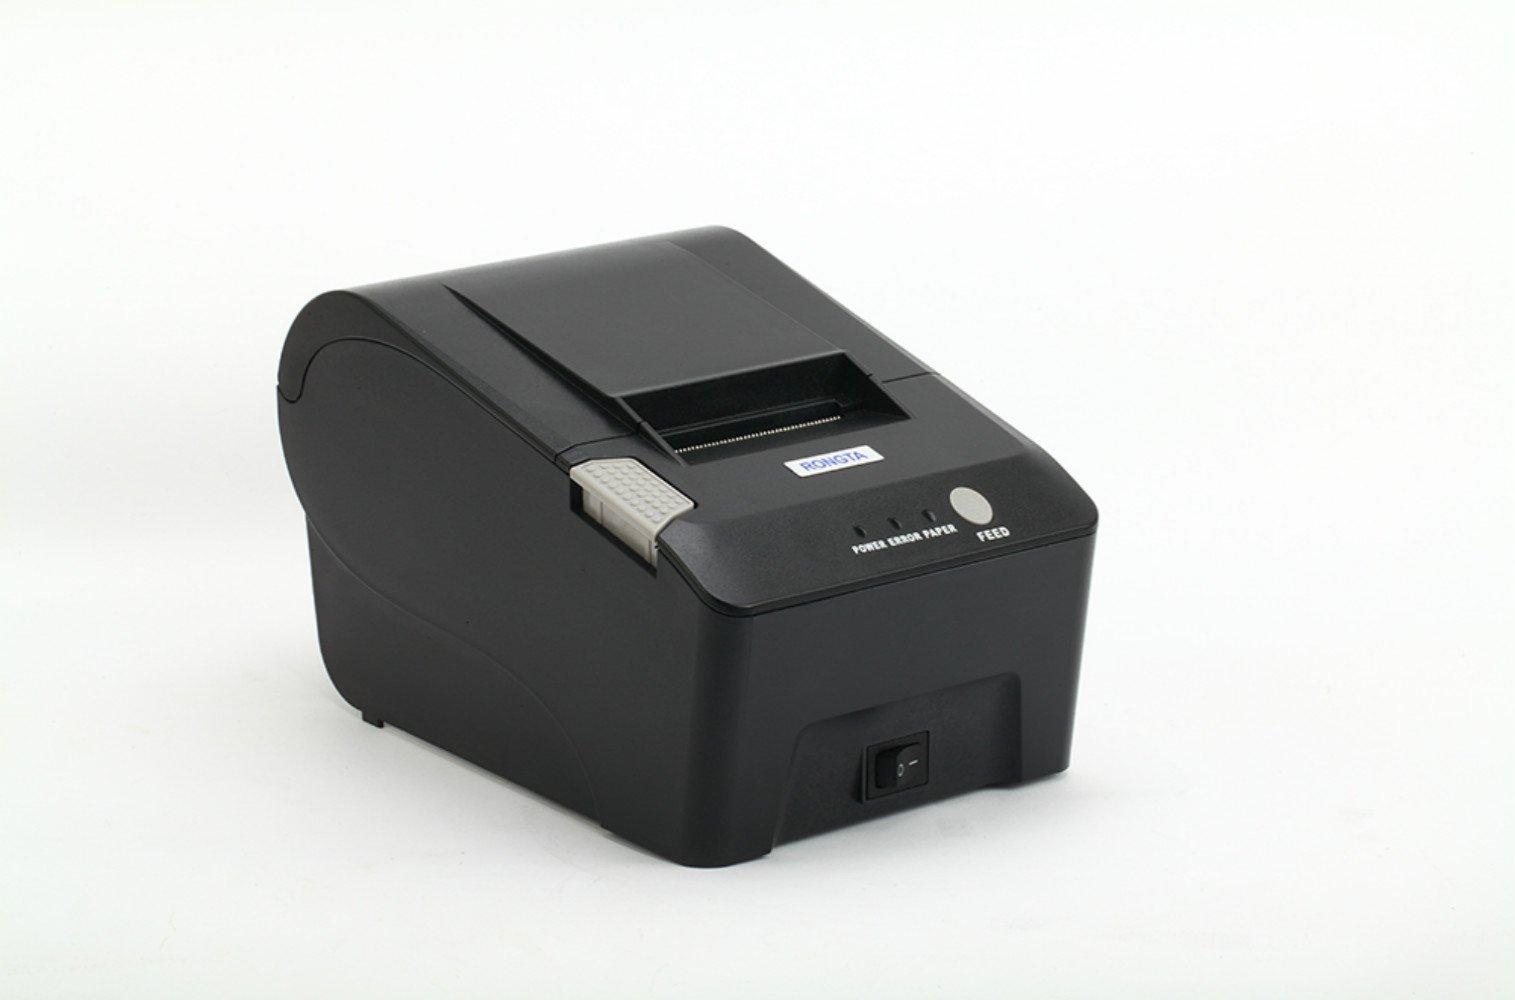 RONGTA RP58S Barcode Printing Label Printers Thermal Line Printer Serial Interface